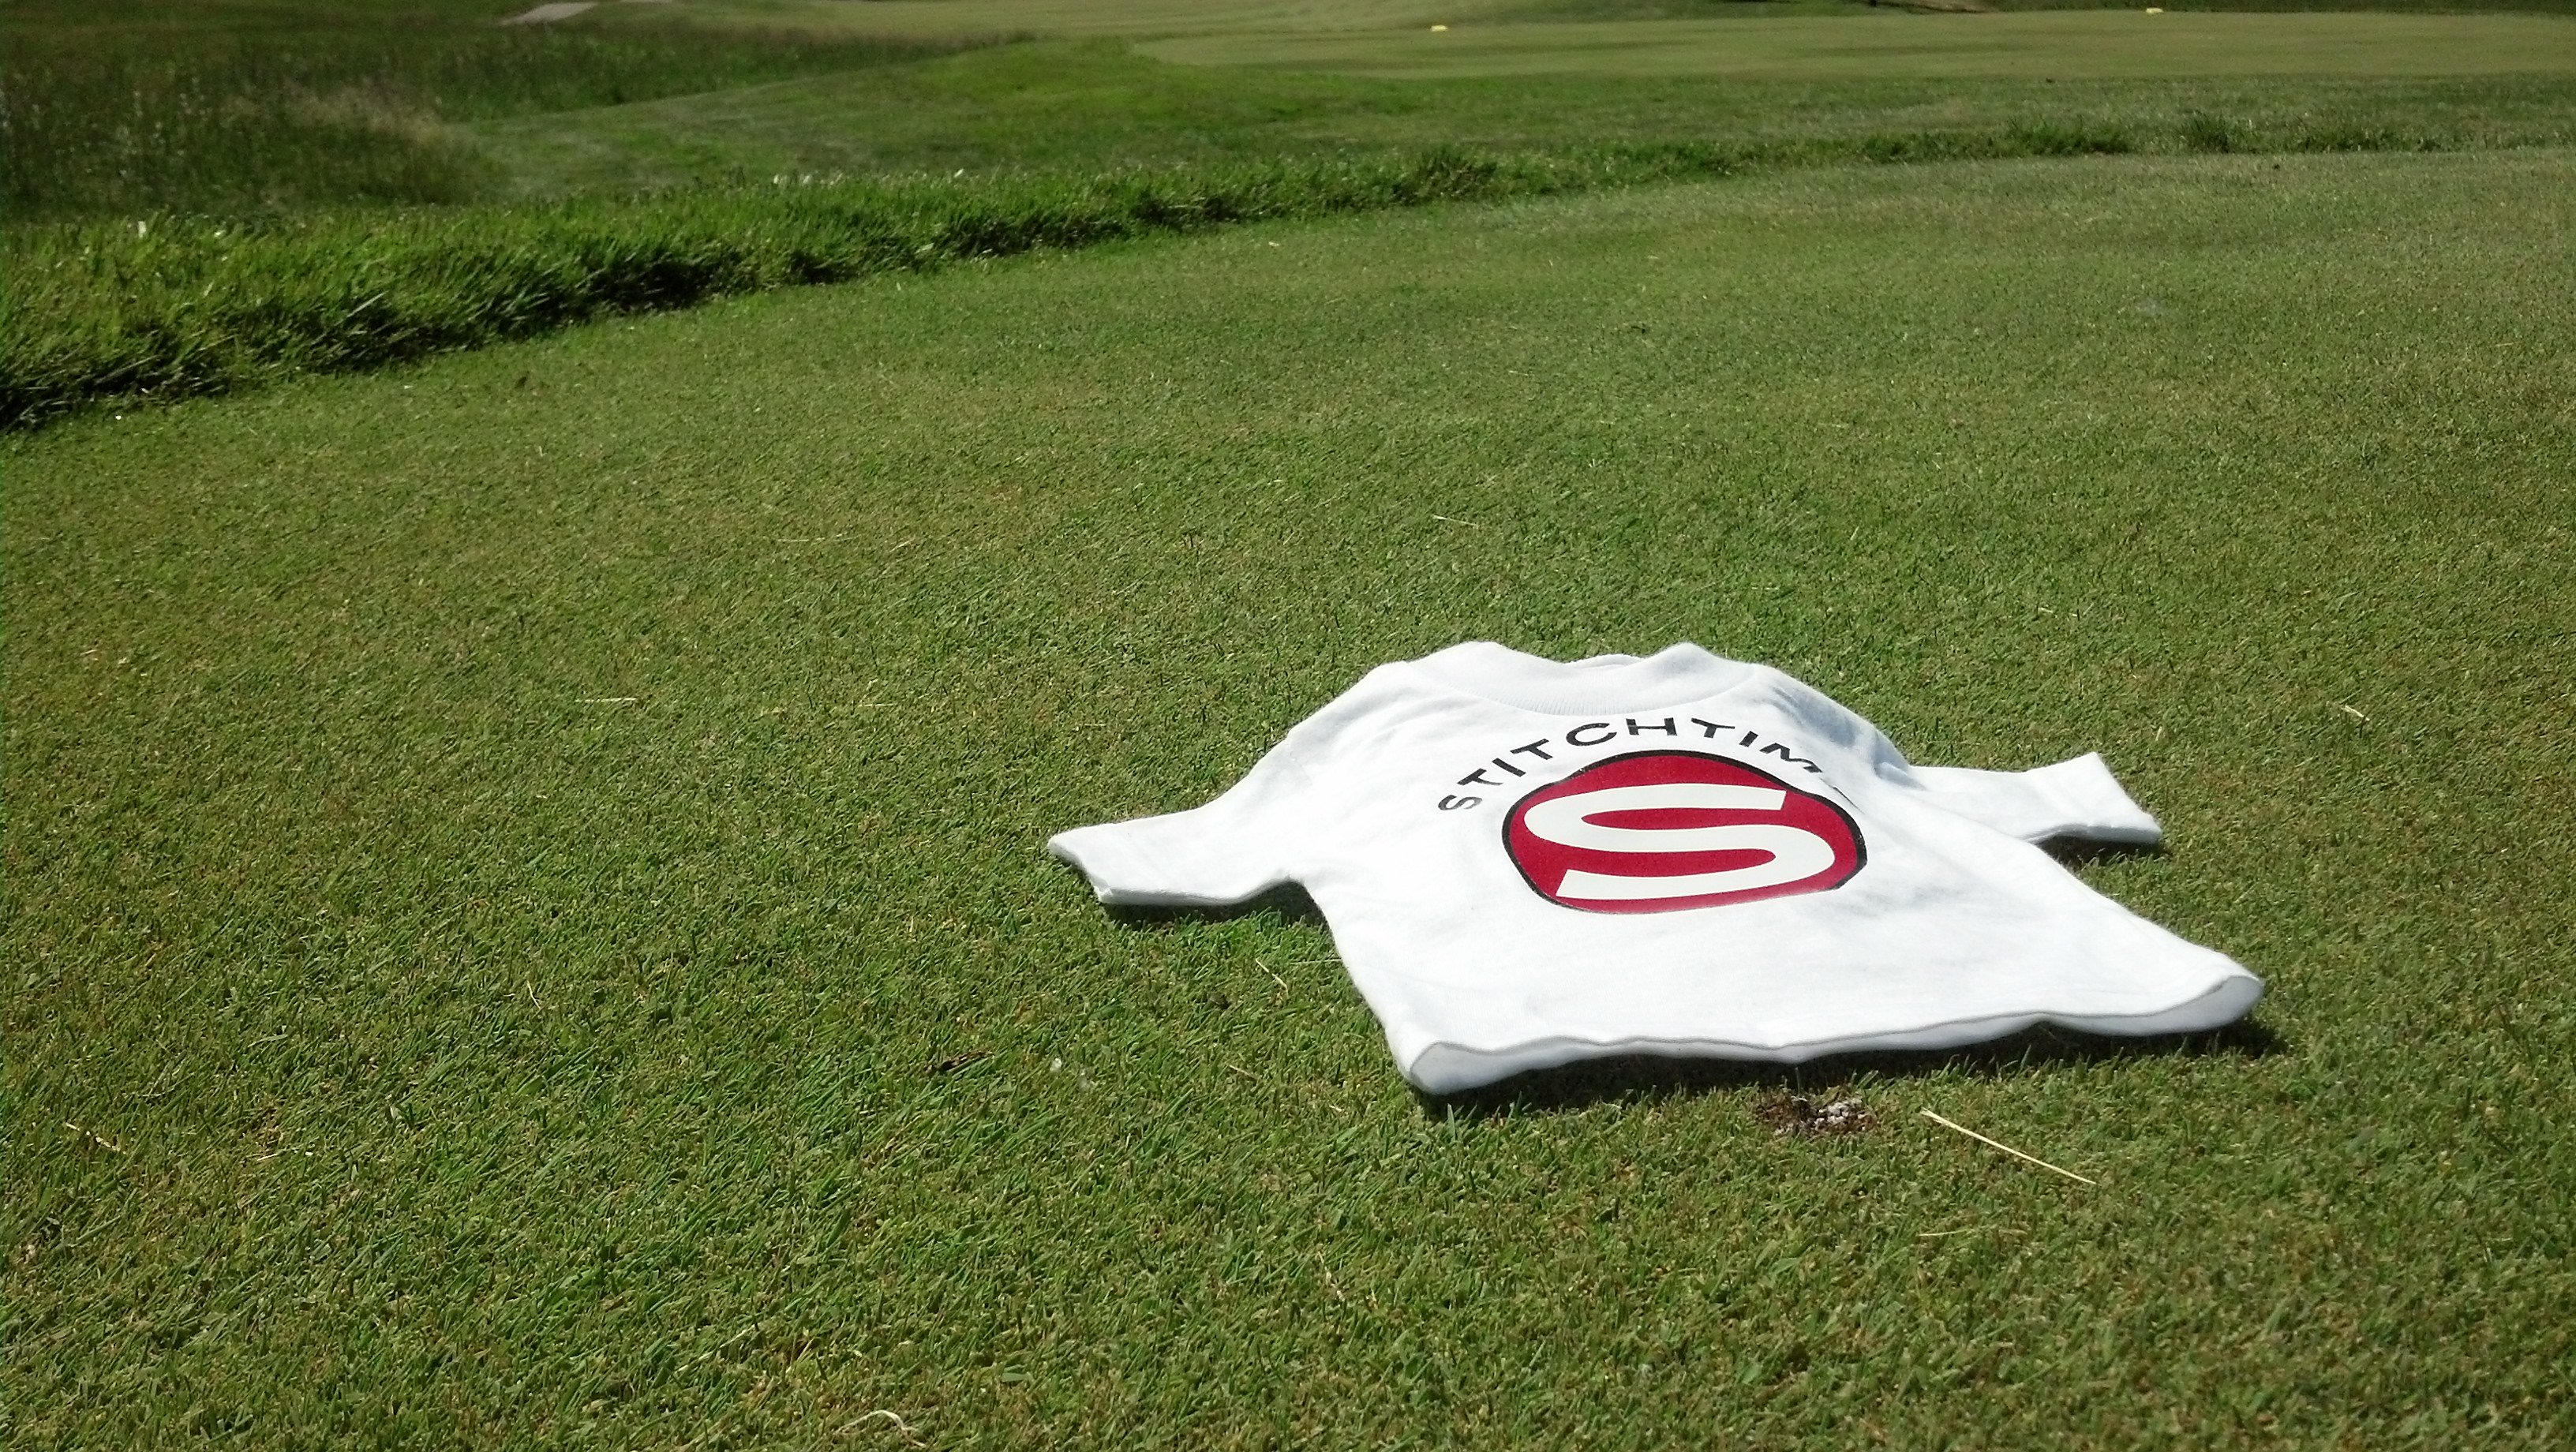 Stitchtime golf